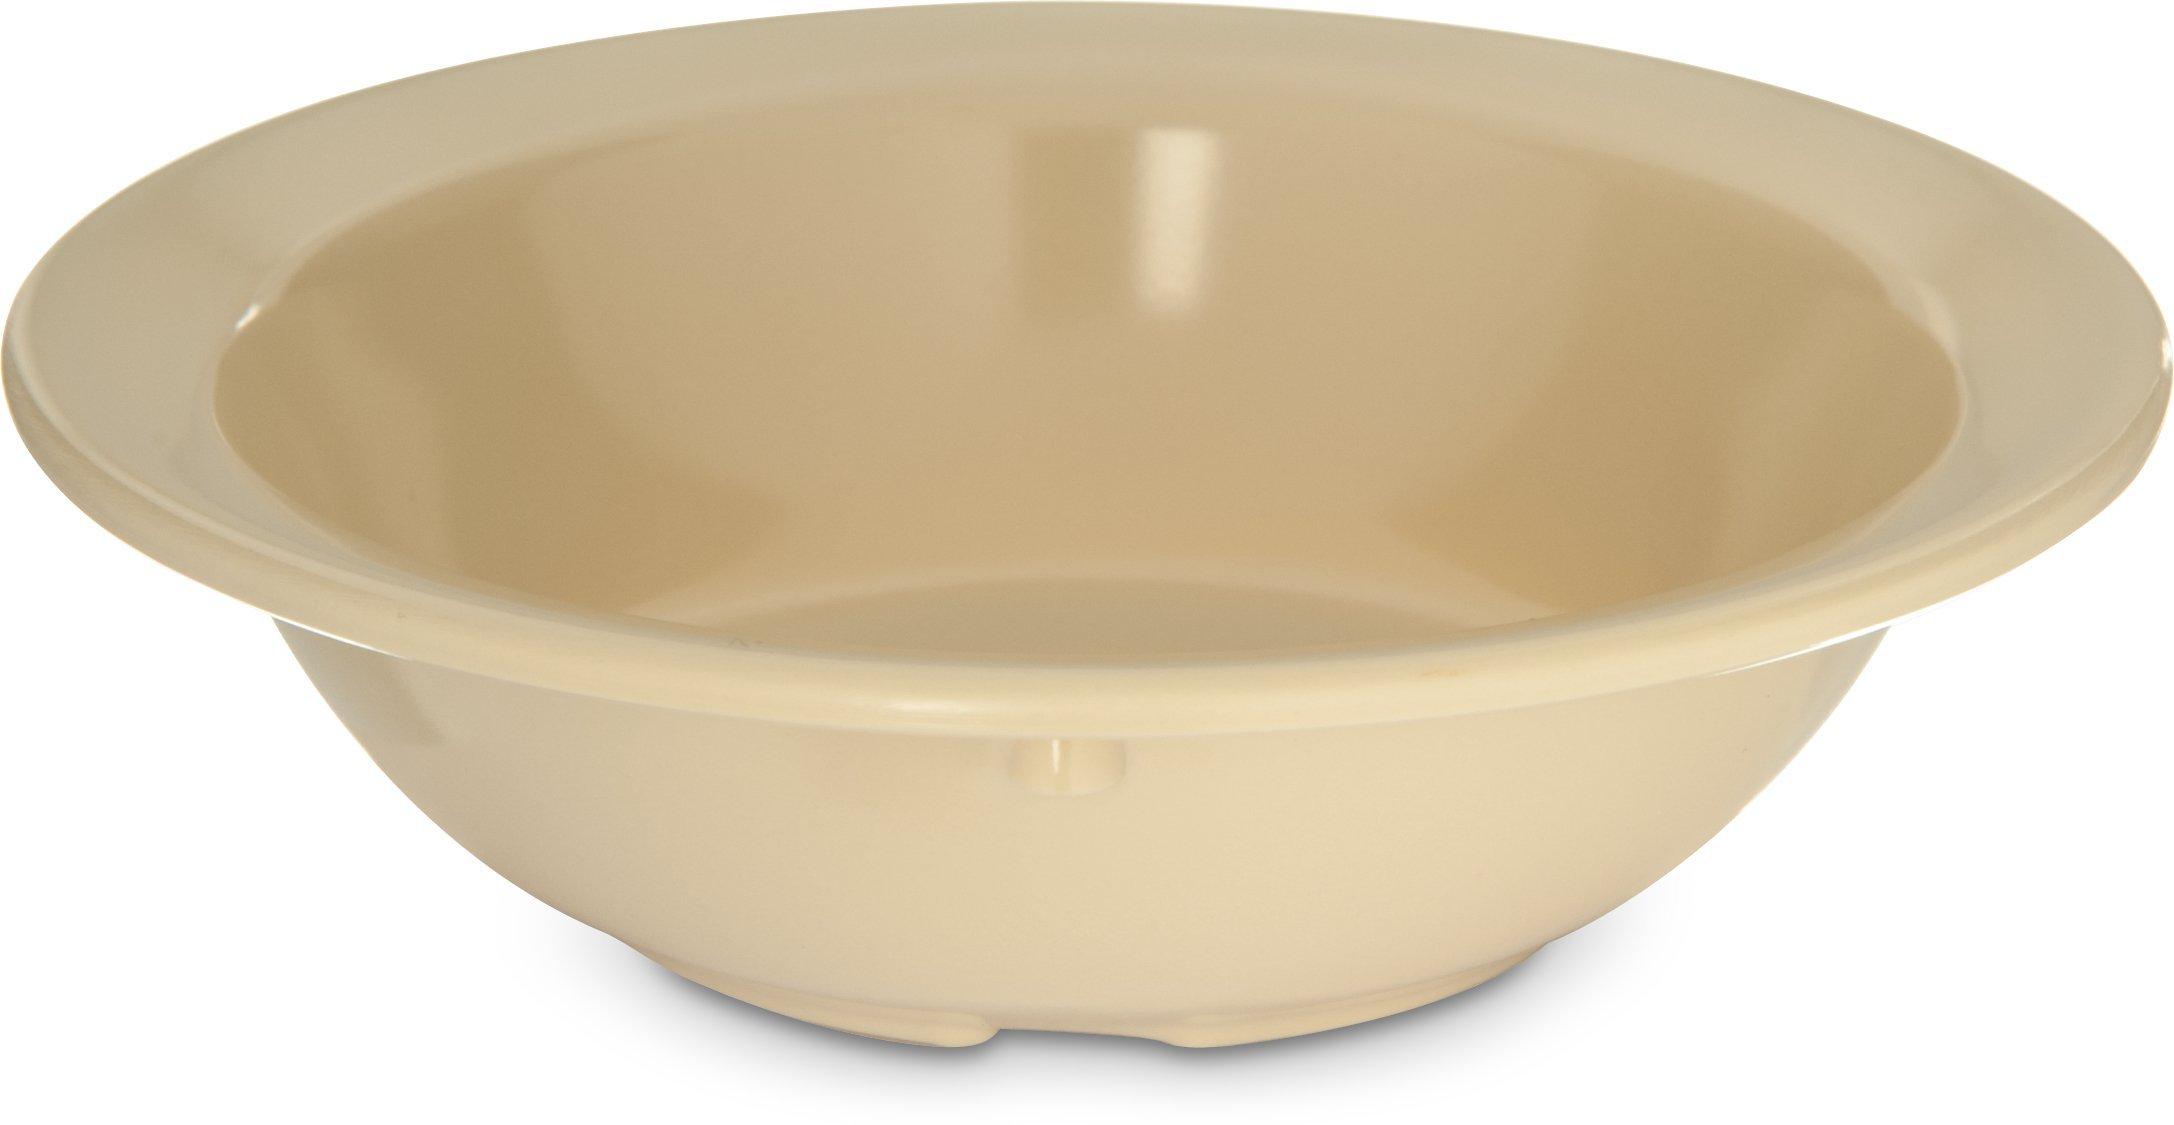 Carlisle 4353125 Dallas Ware Melamine Fruit Bowl, 4.70 fl. oz. Capacity, 4-39/64'' Dia. x 1.28'' H, Tan (Case of 48)